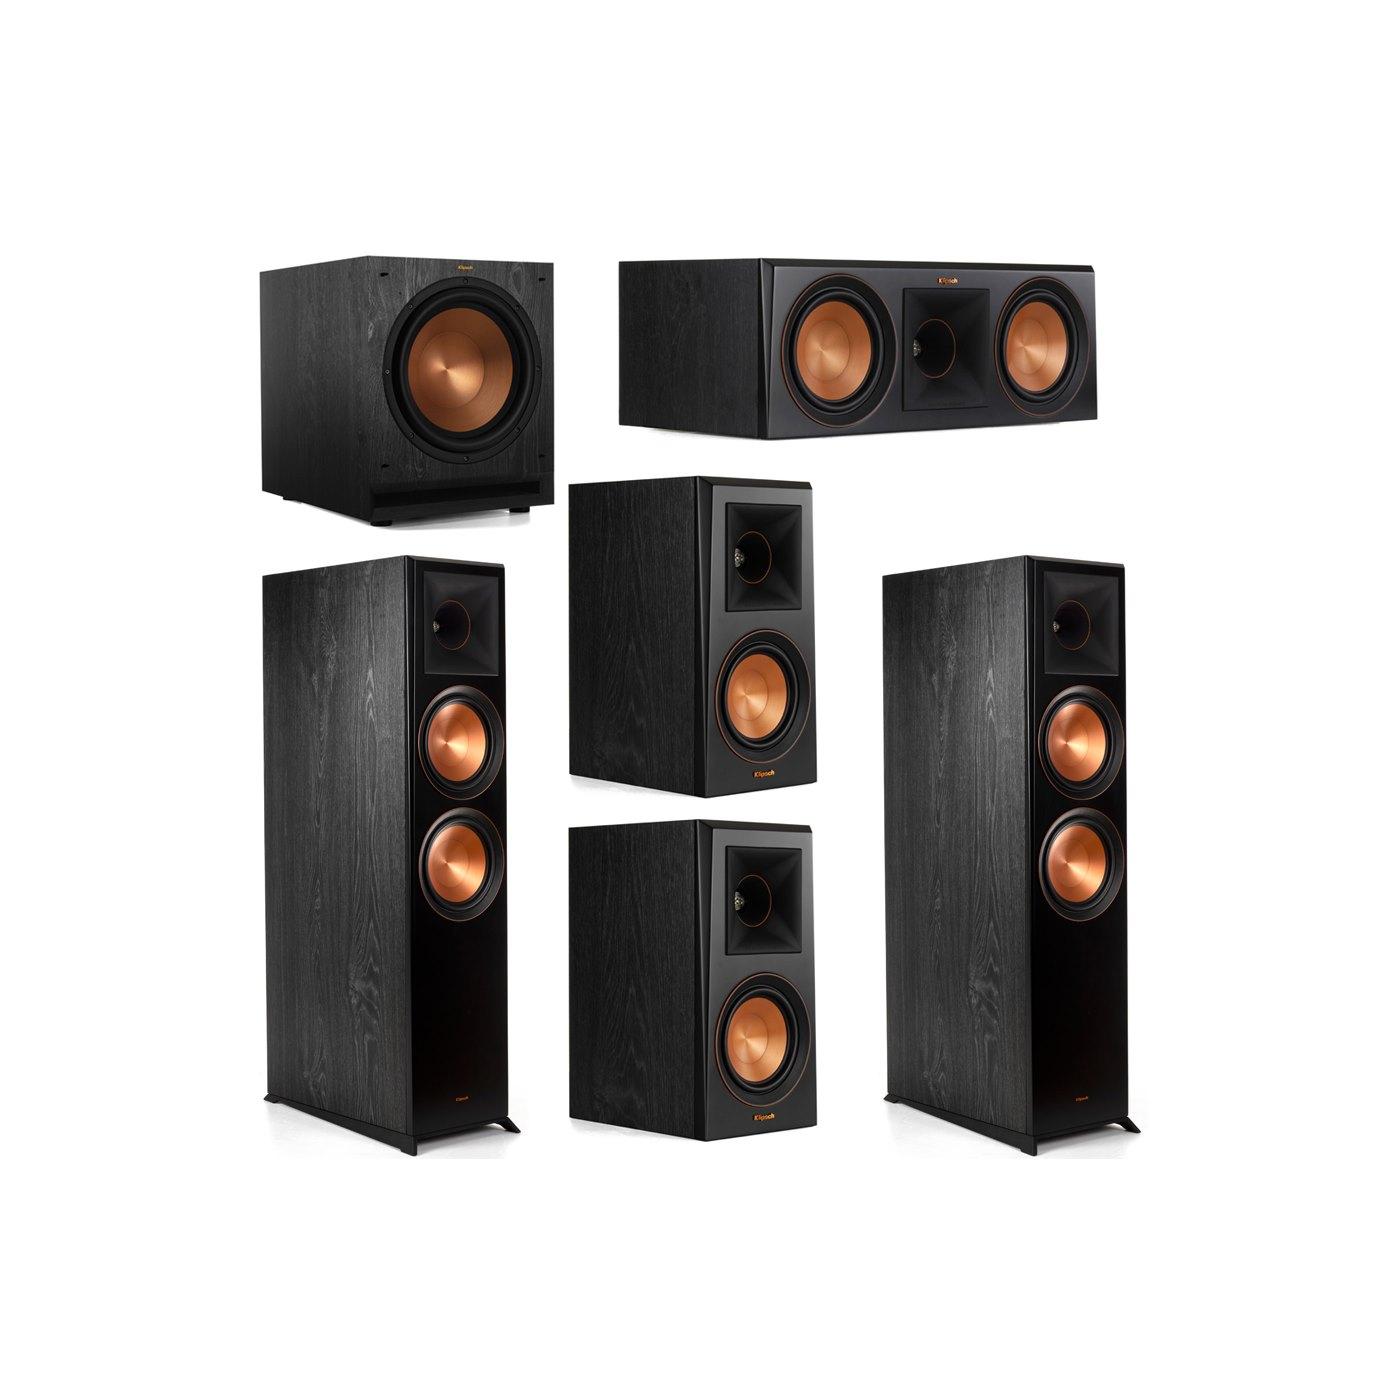 Klipsch 5.1 System with 2 RP-8000F Floorstanding Speakers, 1 Klipsch RP-600C Center Speaker, 2 Klipsch RP-500M Surround Speakers, 1 Klipsch SPL-120 Subwoofer